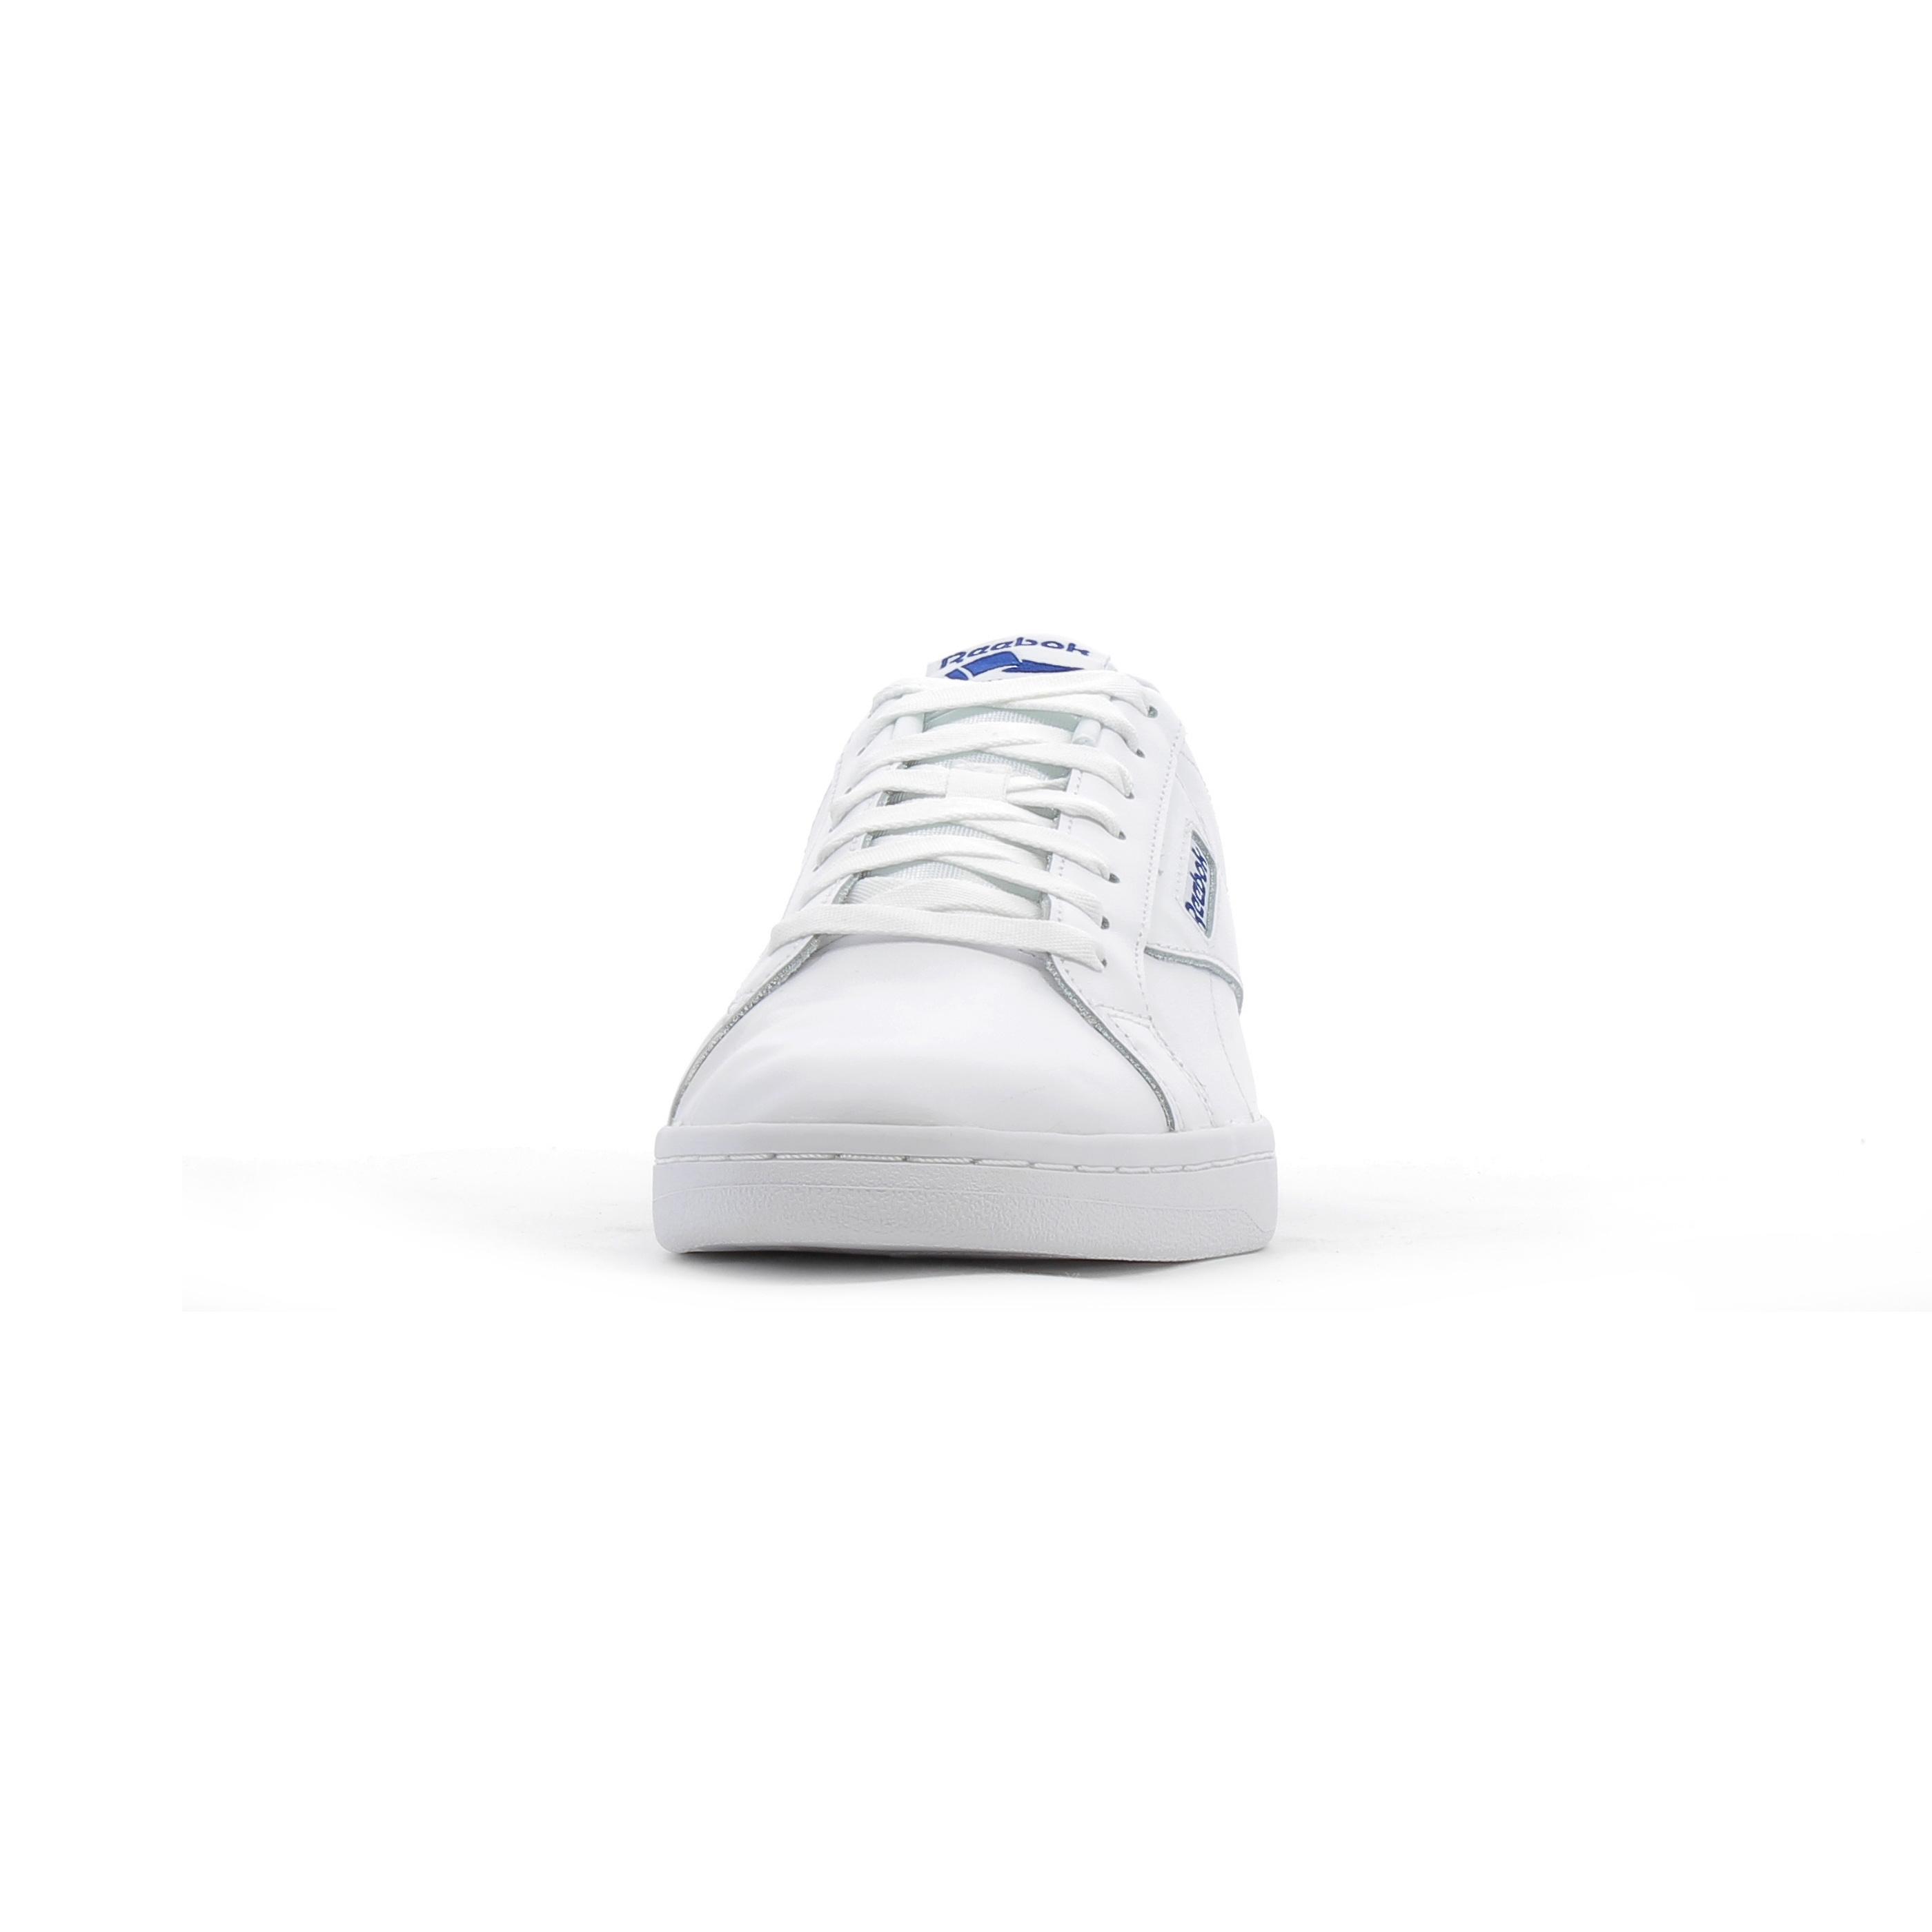 Sneakers Reebok Royal Complete CLN Lx